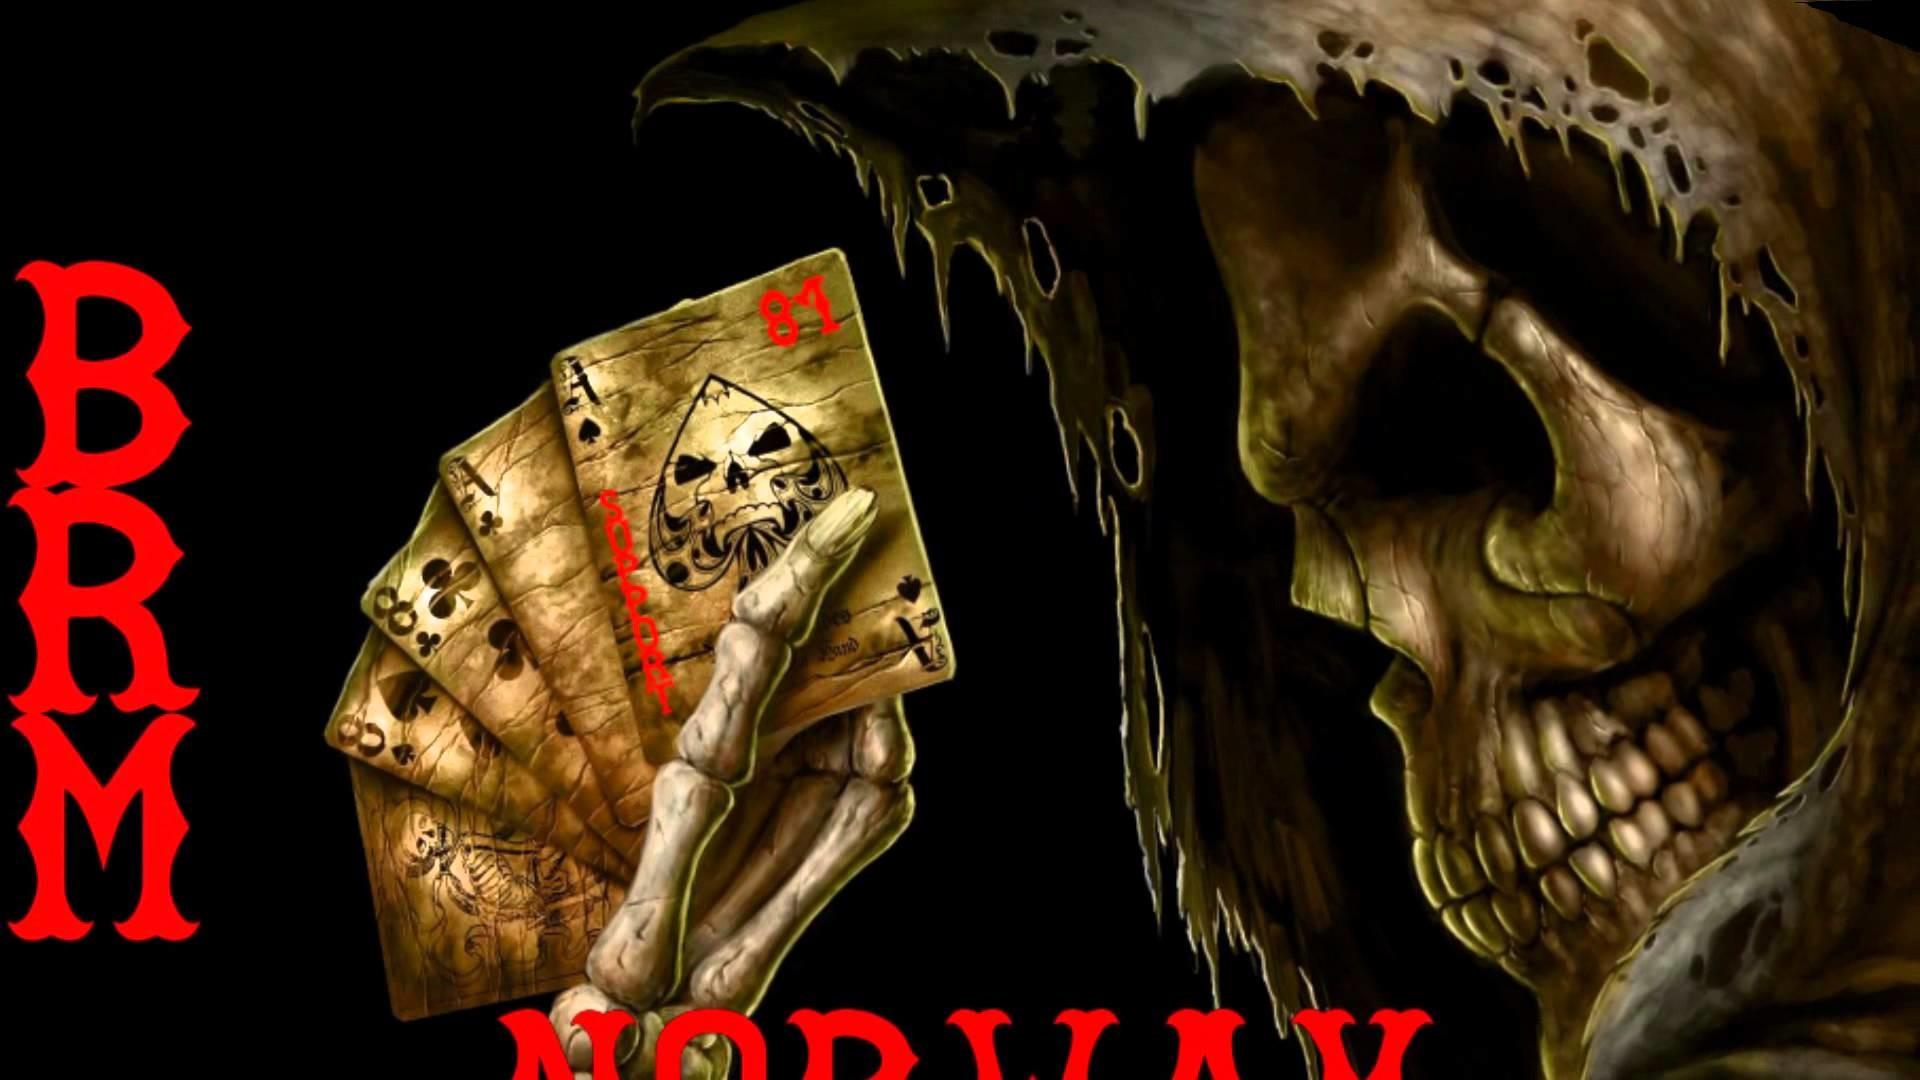 Explore Skull Wallpaper, Hd Wallpaper, and more!